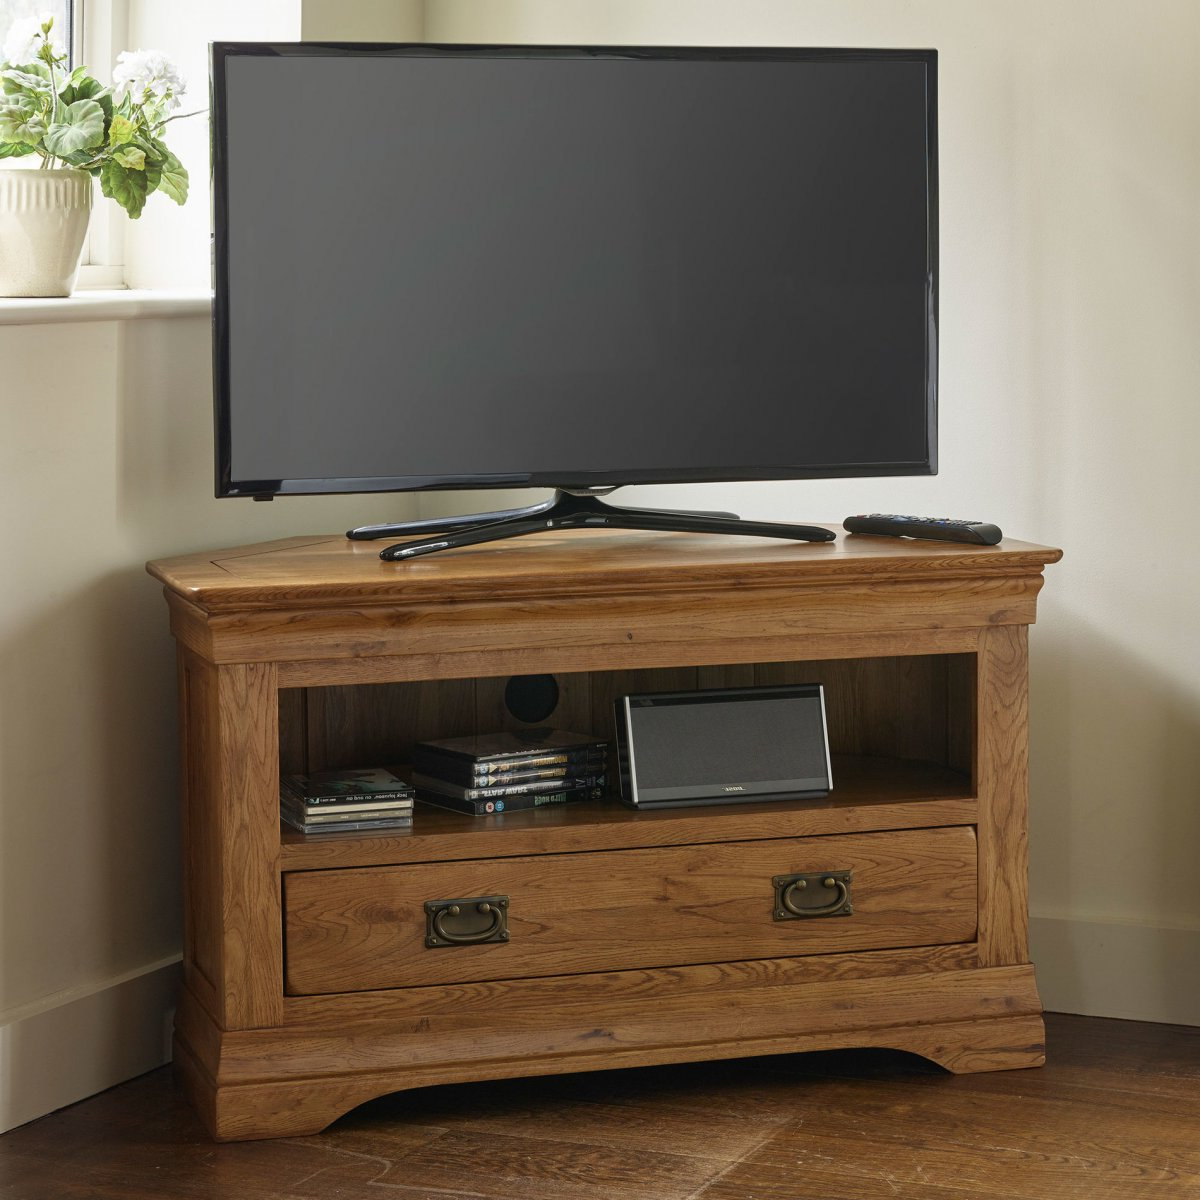 French Farmhouse Corner Tv Unit | Solid Oak | Oak Inside Stuart Geometric Corner Fit Glass Door Tv Stands (View 14 of 17)